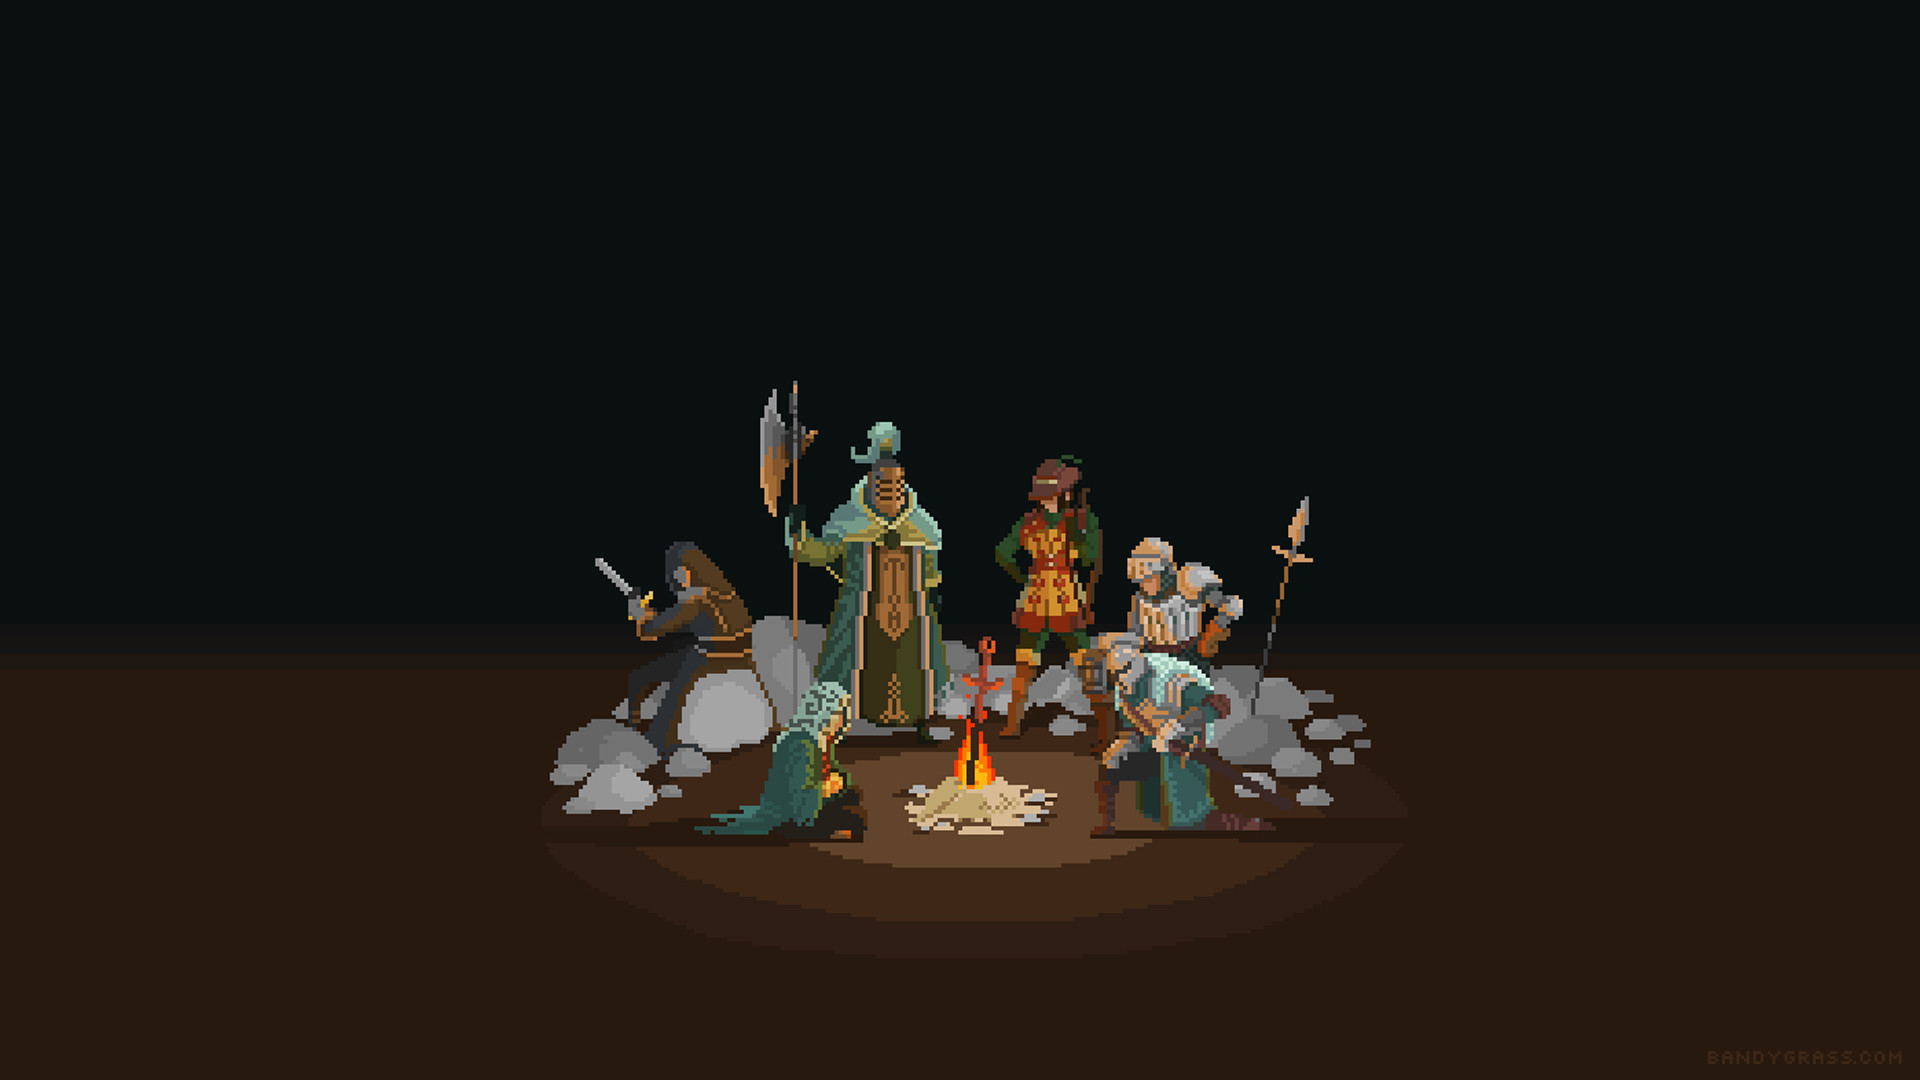 Dark Souls 3 Animated Background